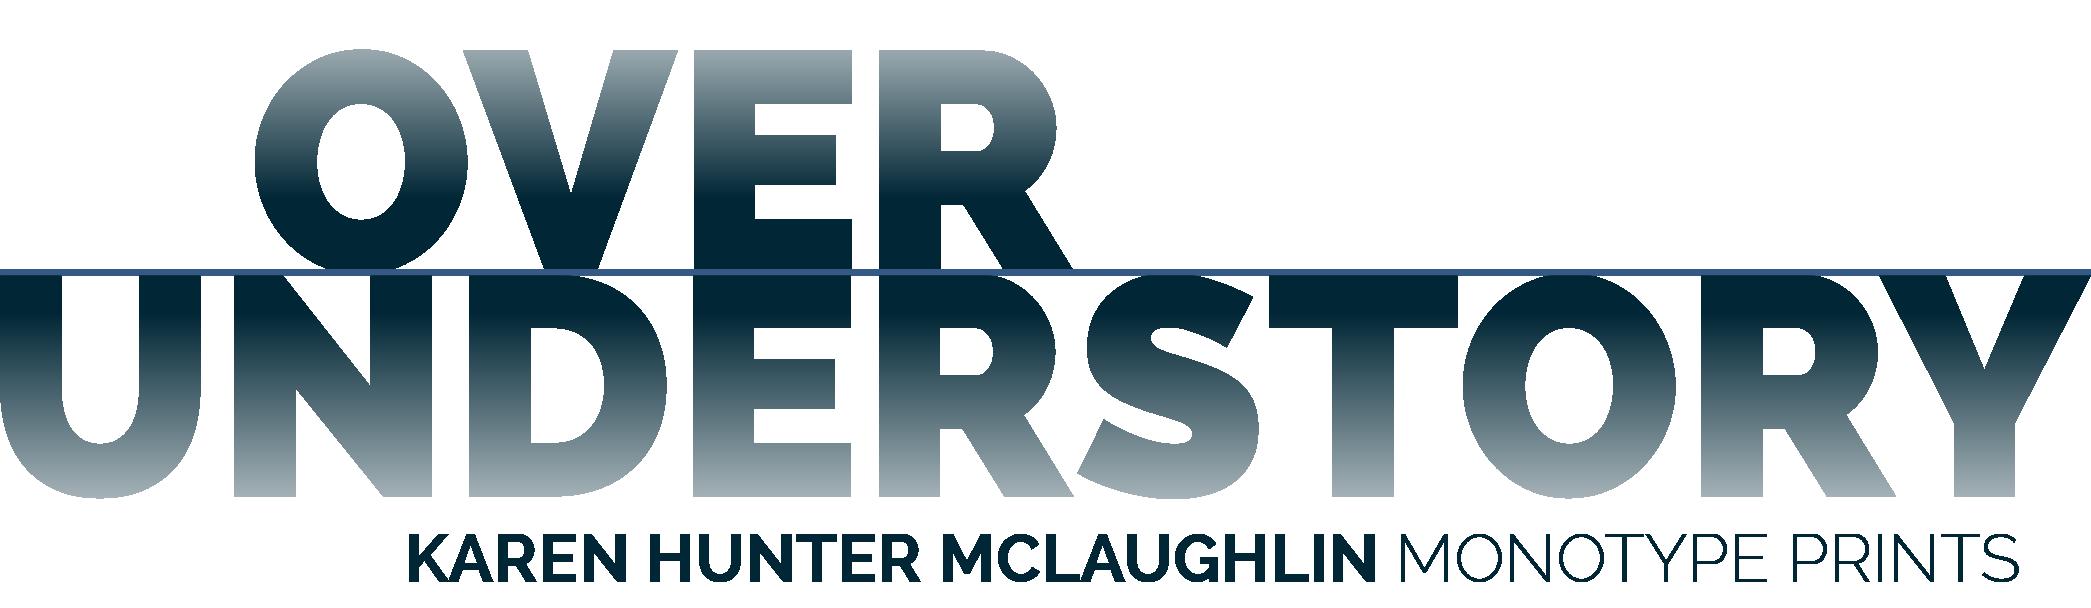 Karen Hunter McLaughlin Over Understory